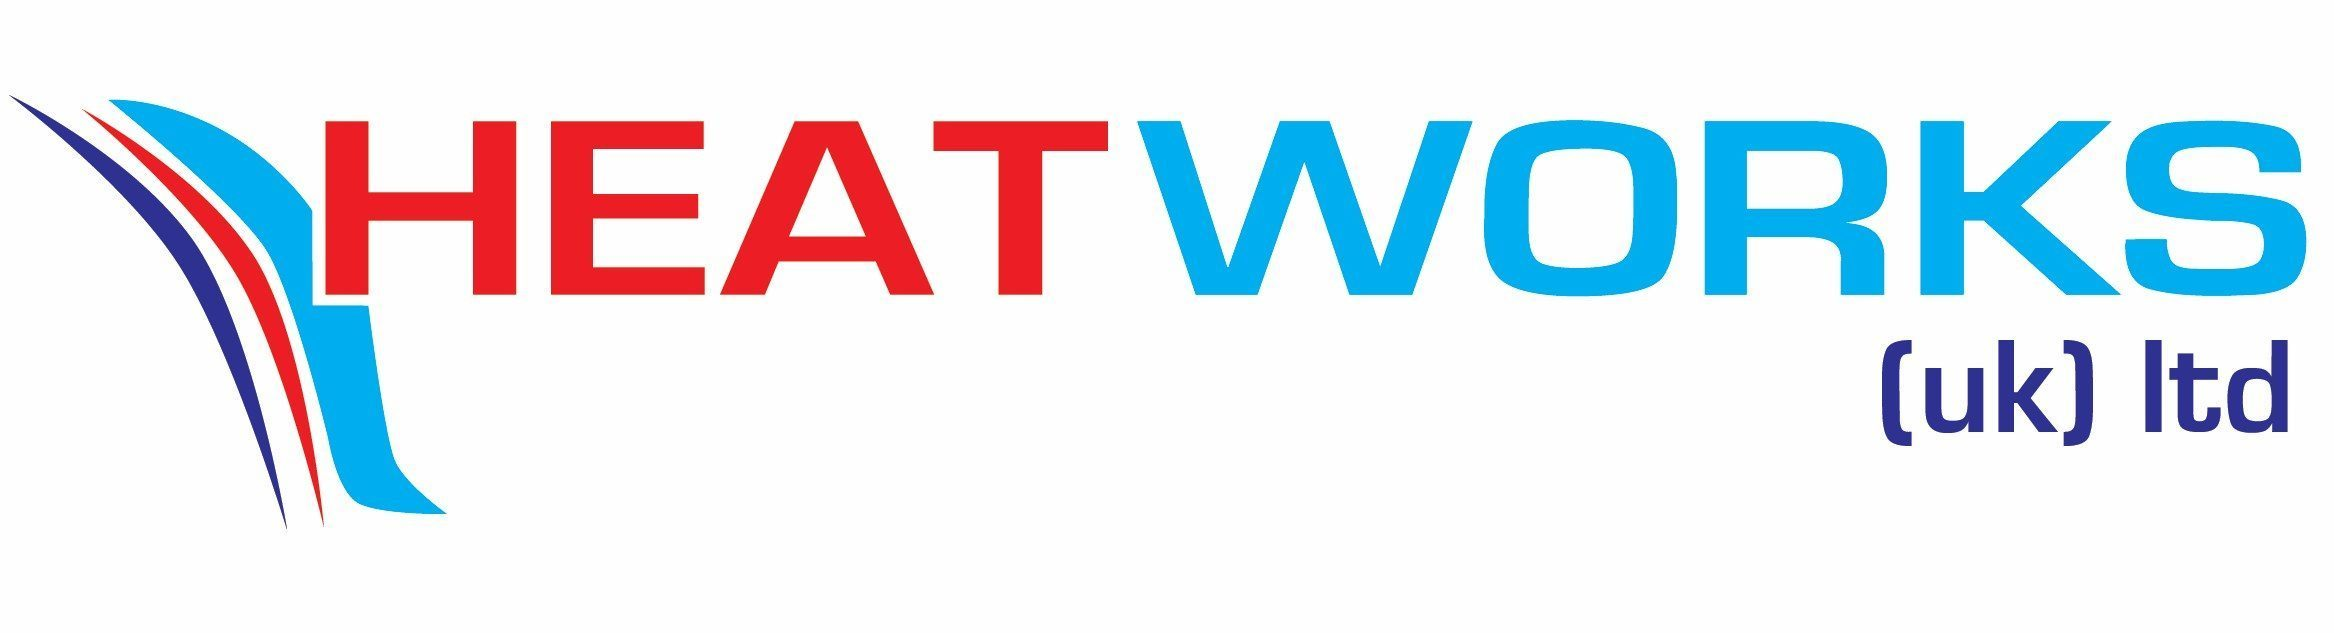 Heatworks logo